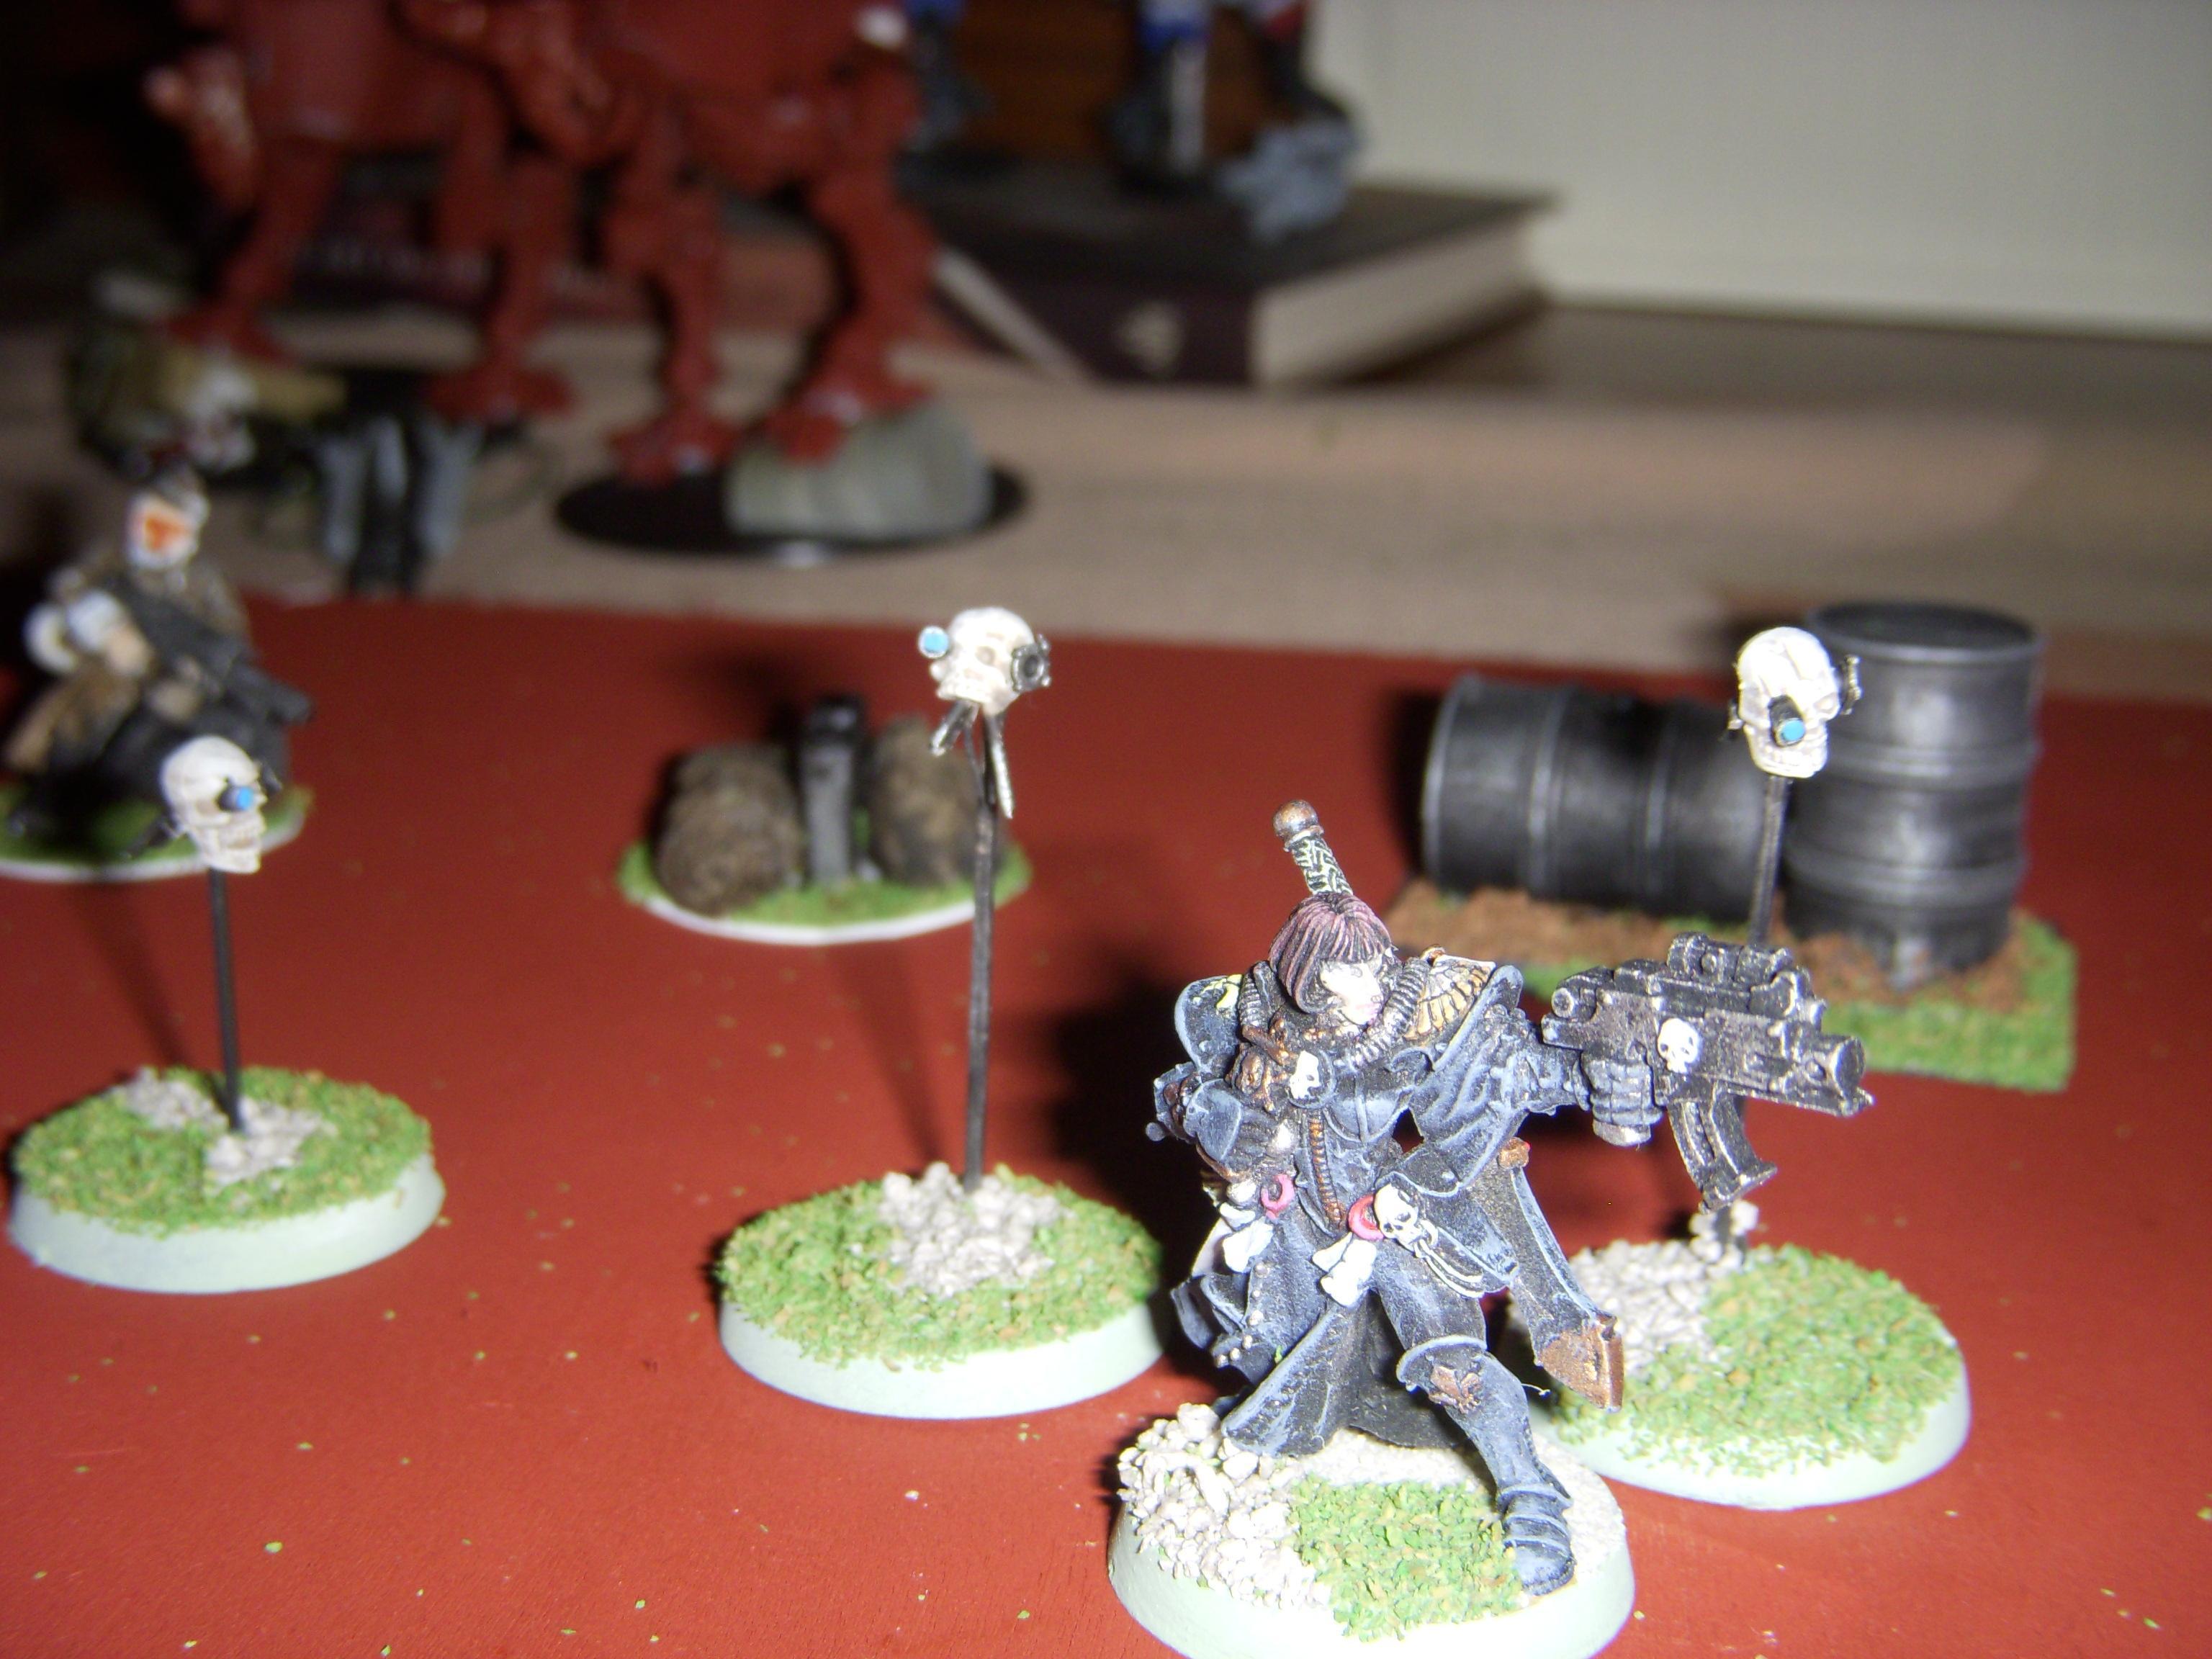 Henchmen, Inquisitor, Servo-skull